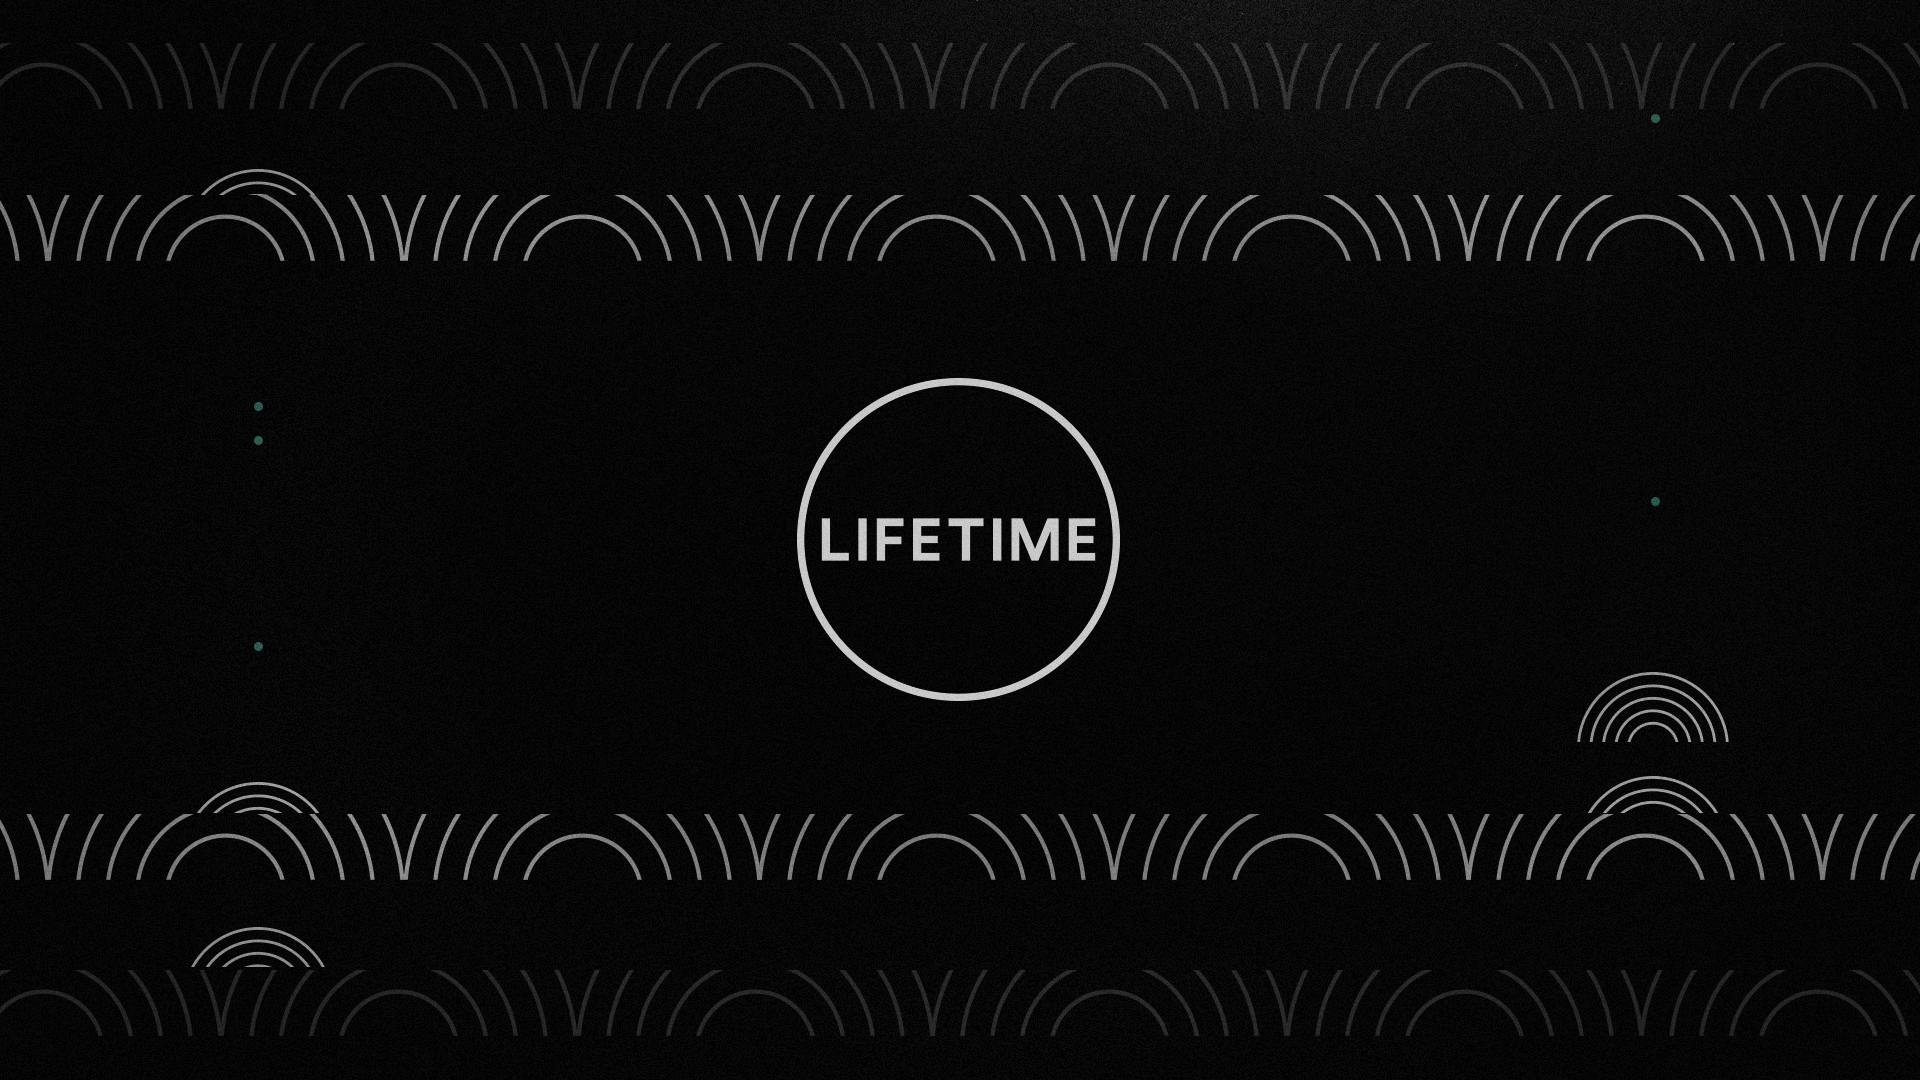 A+E_Upfront_Lifetime_02_transition.jpg